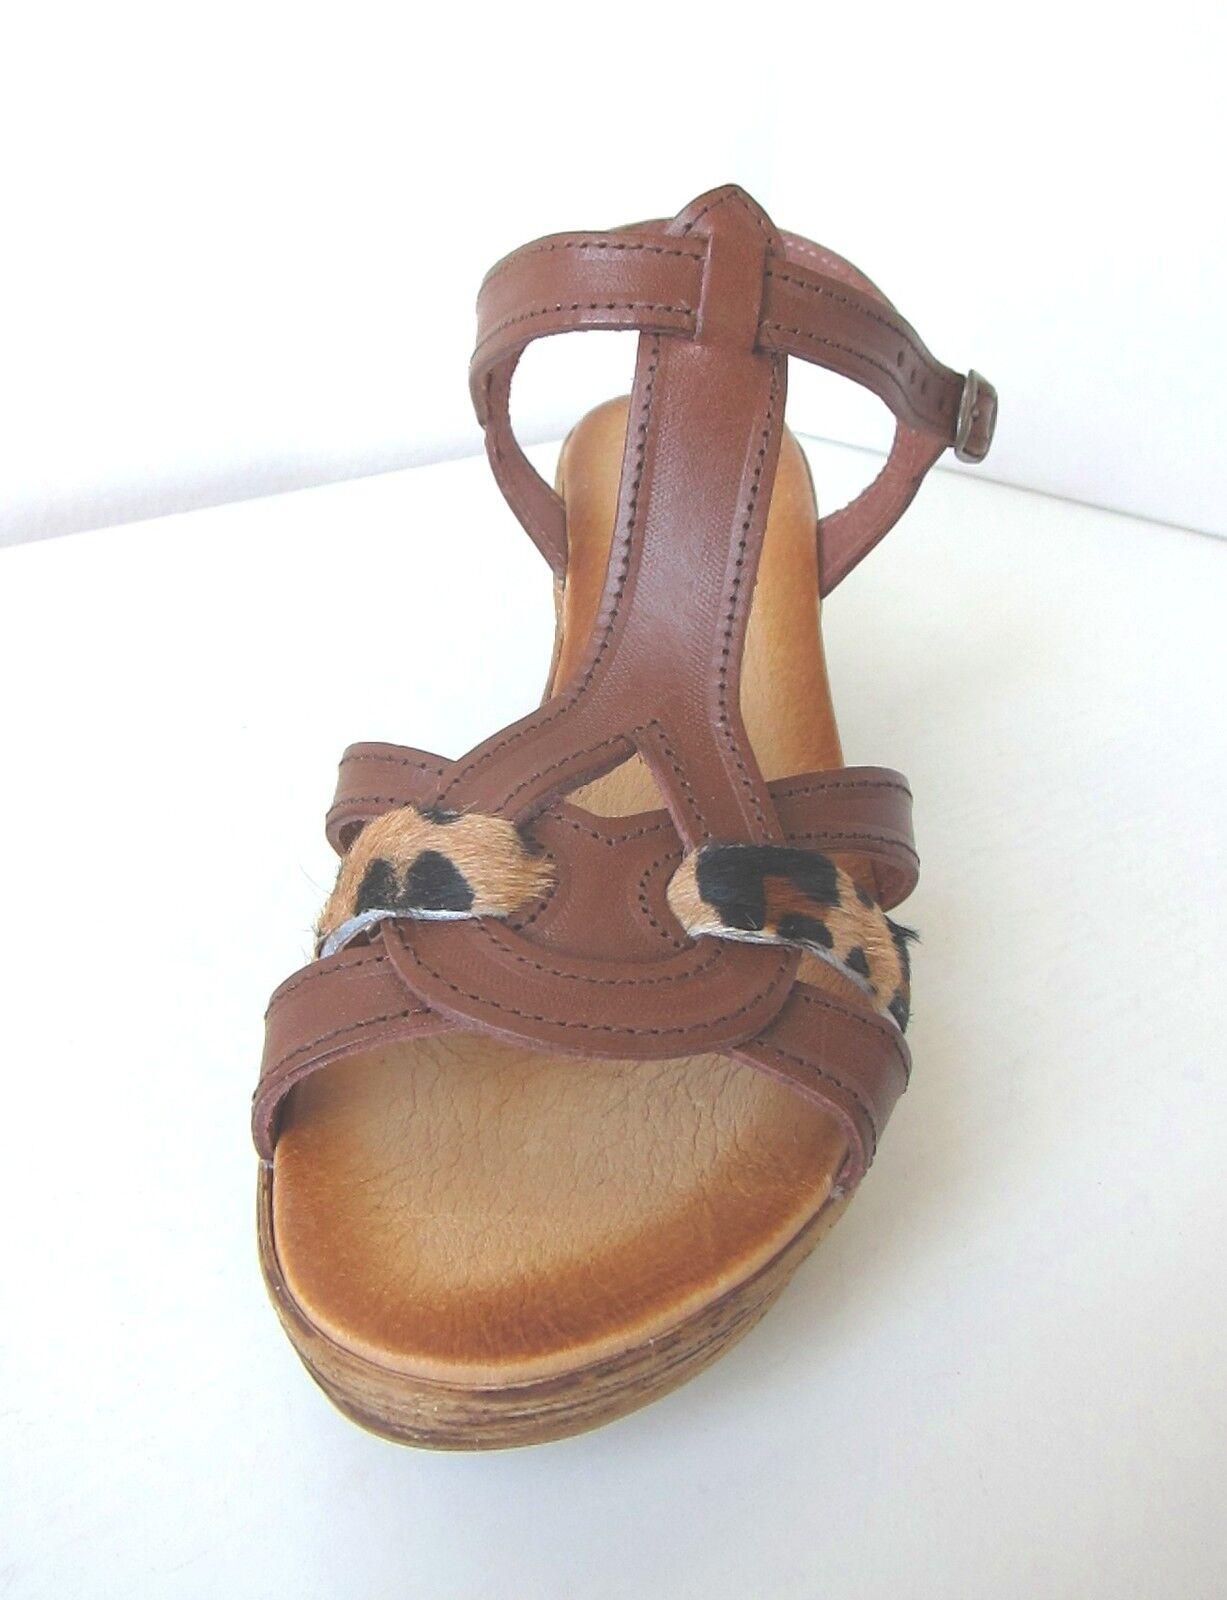 22f3361e7870d Tamaris Wedge Sandals Chocolate Brown Leo 41 Platform Platform ...